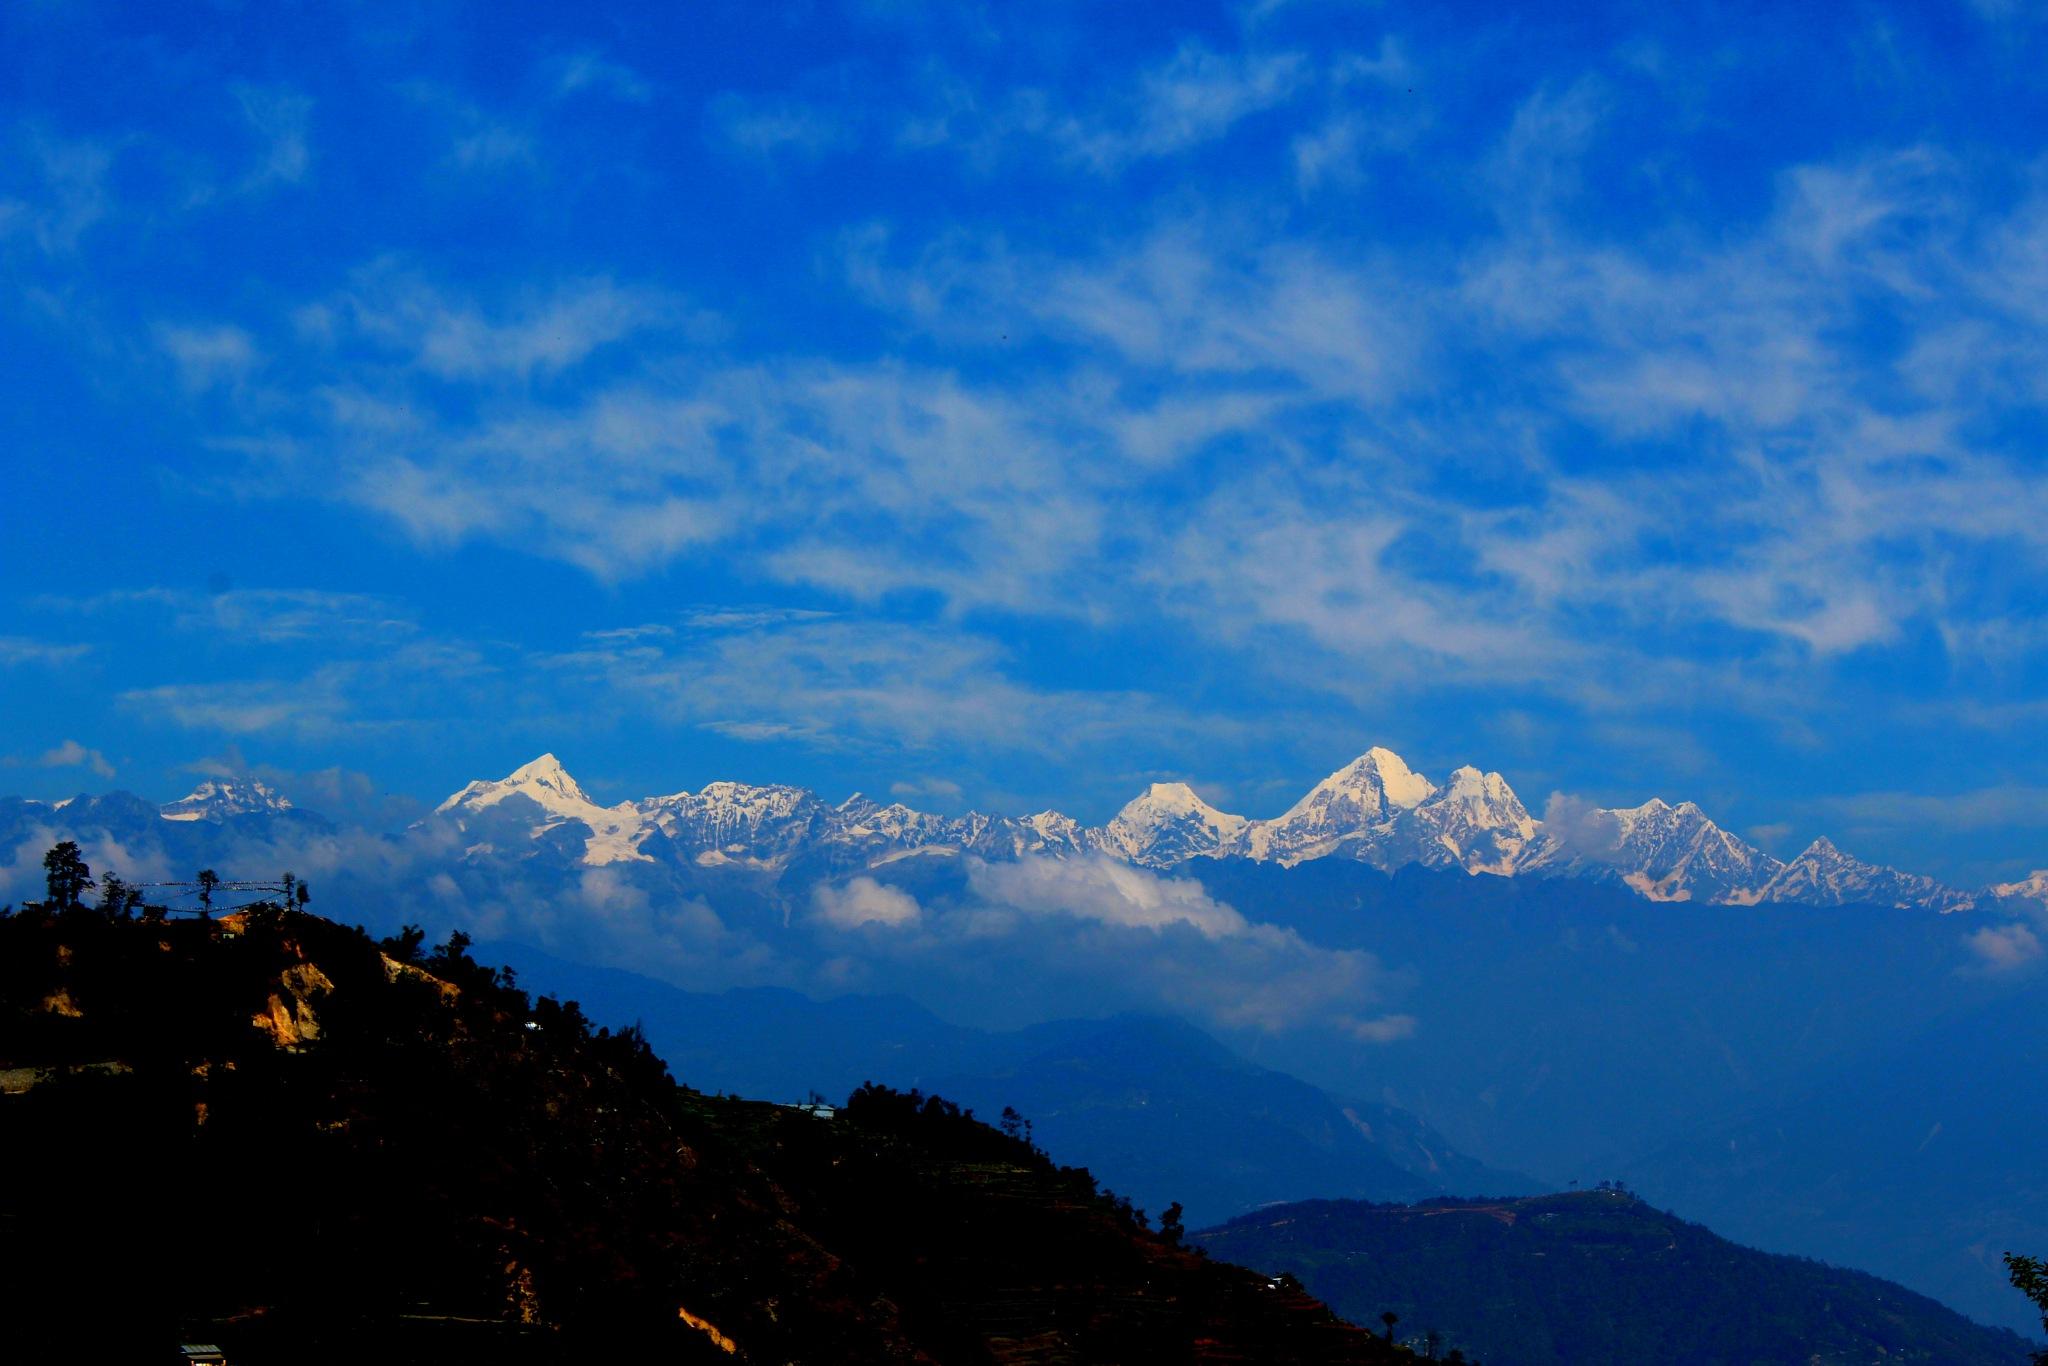 Langtang range seen from Kathmandu, Nepal by SA B TA